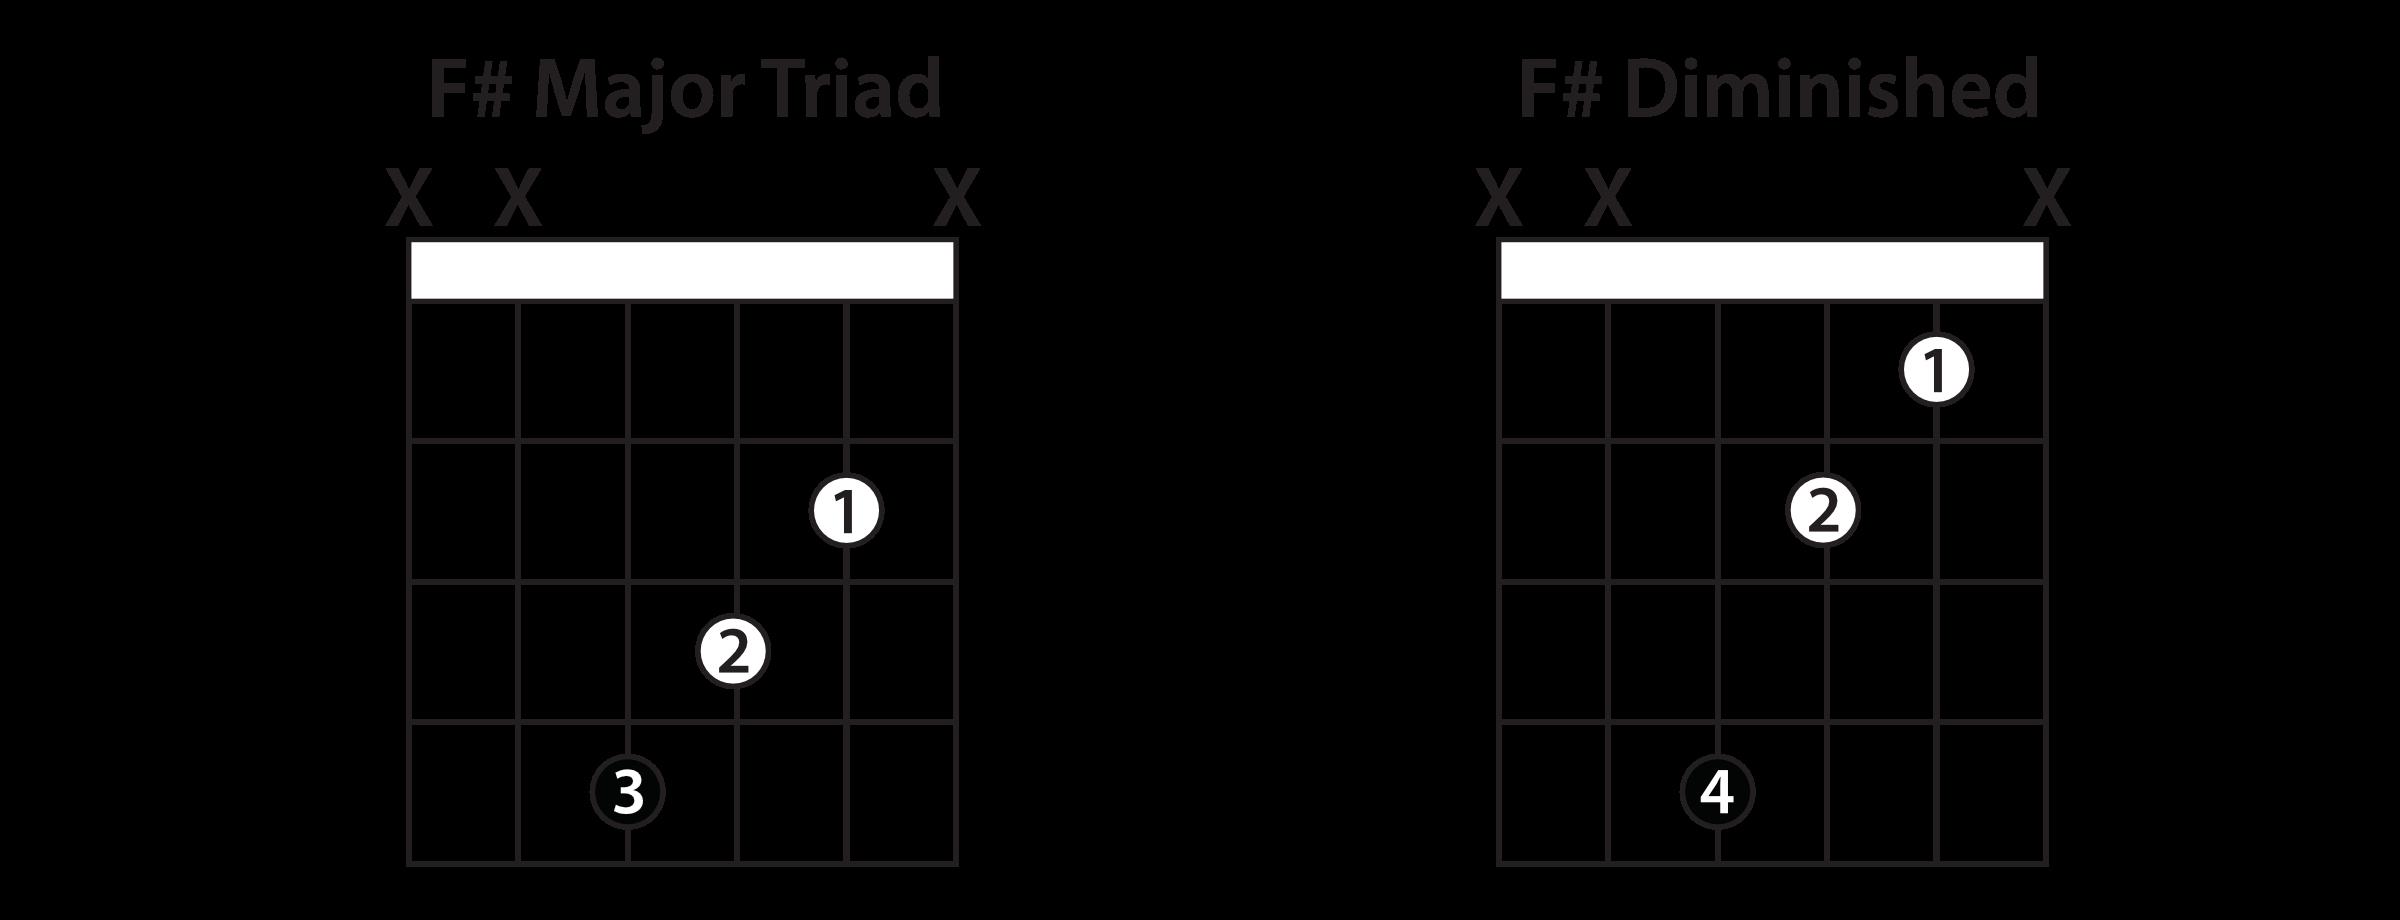 B Minor Guitar Chord Guitar Chords In A Major Key Guitar Lesson